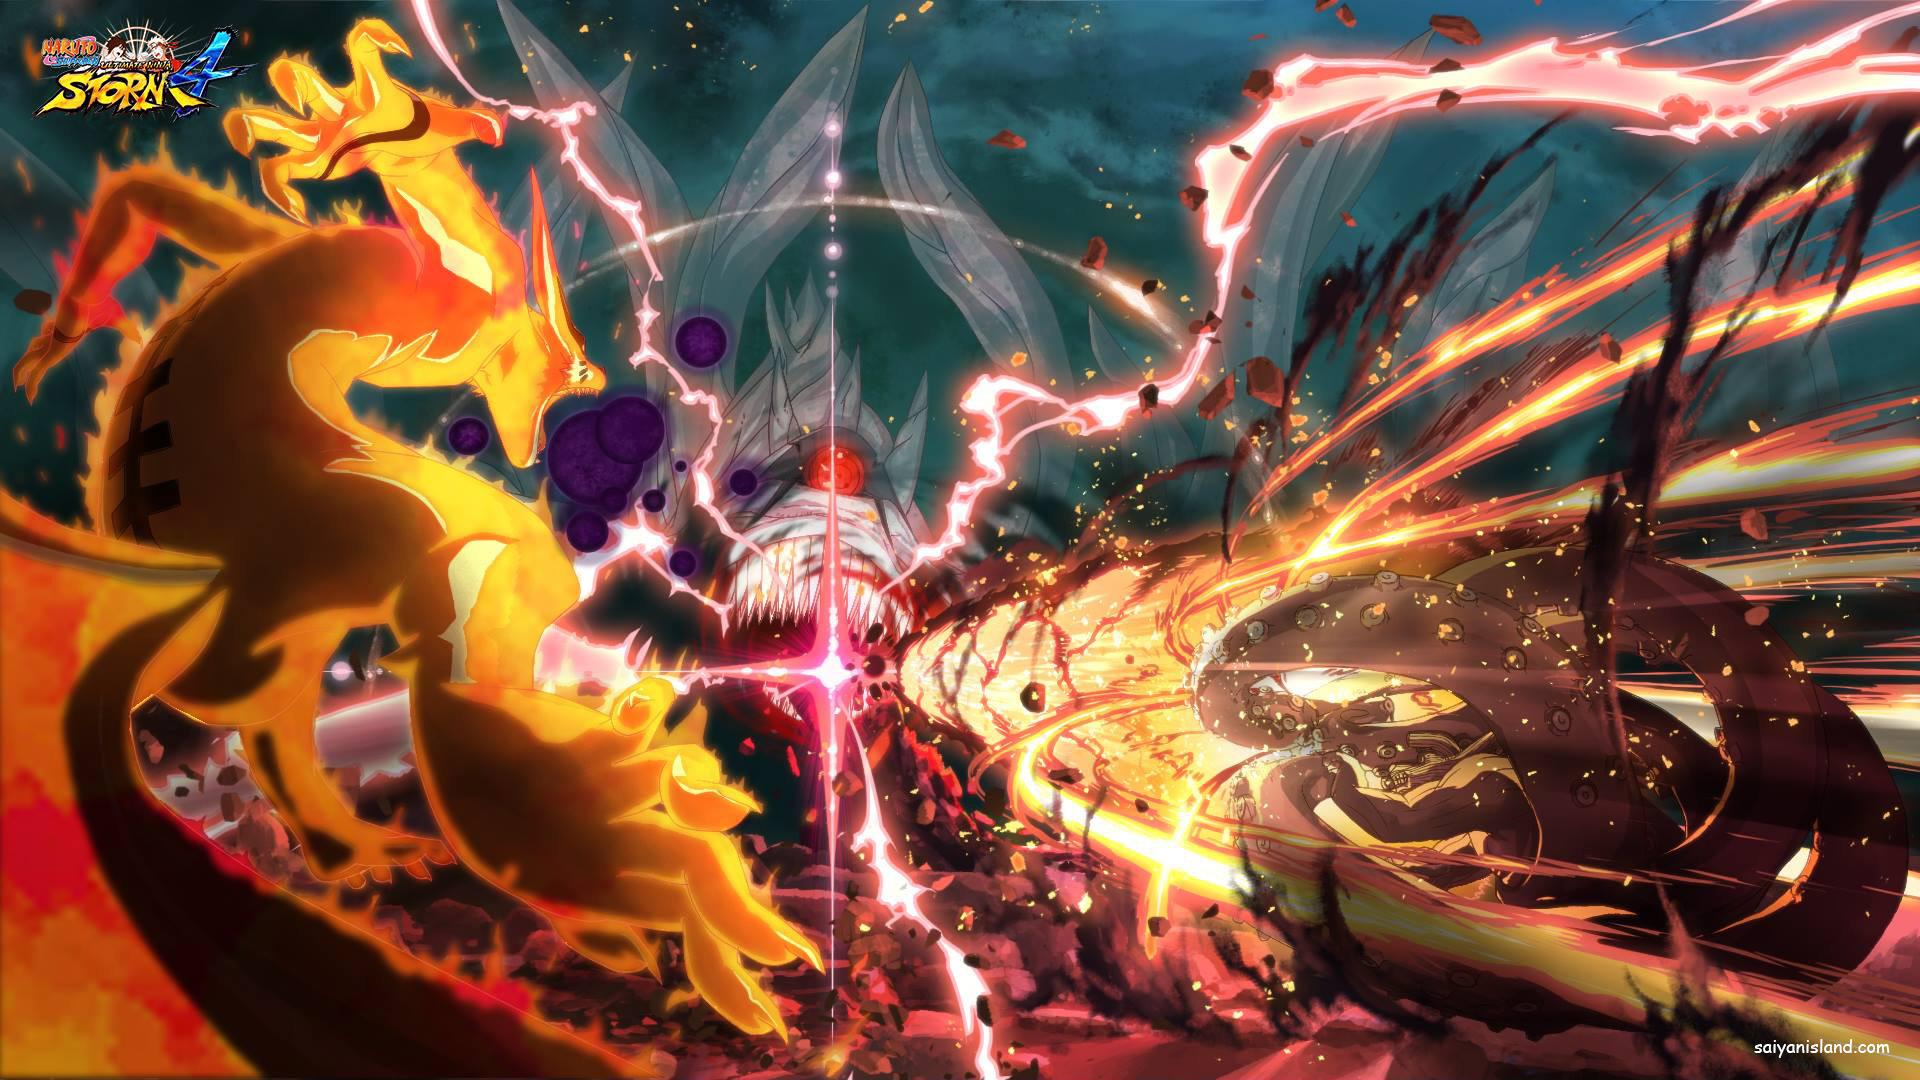 1 Naruto Shippuden: Ultimate Ninja Storm 4 Fonds d'écran HD | Arrière-plans - Wallpaper Abyss